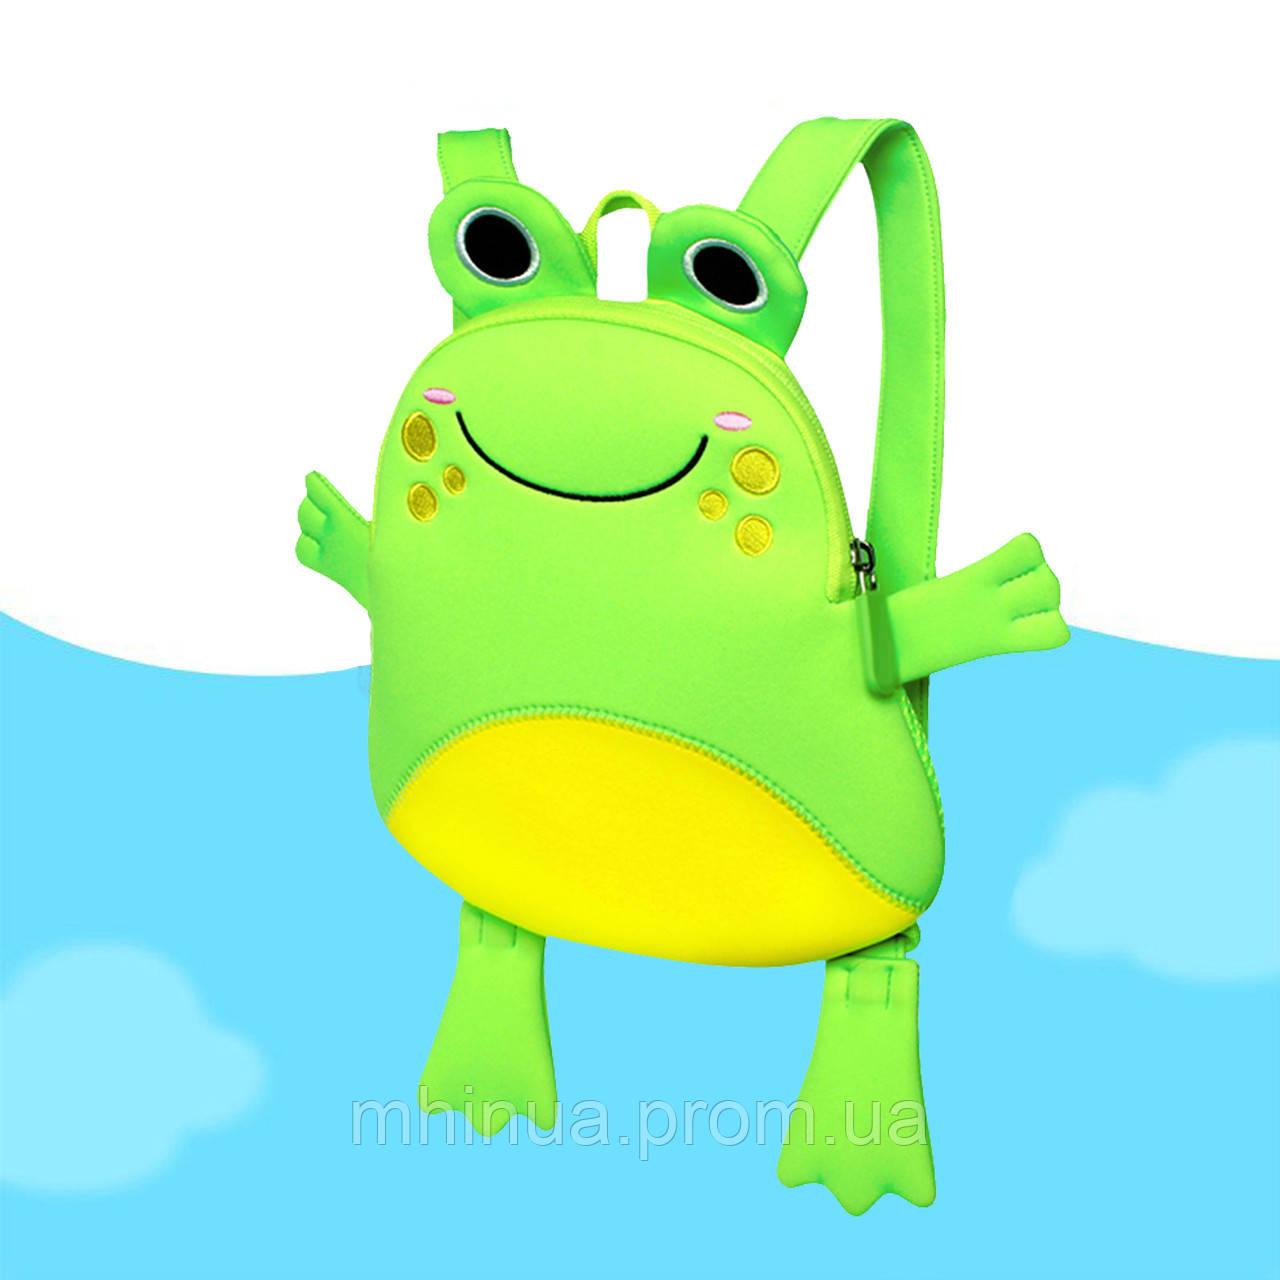 Дитячий рюкзак Nohoo Жабеня (NH056)